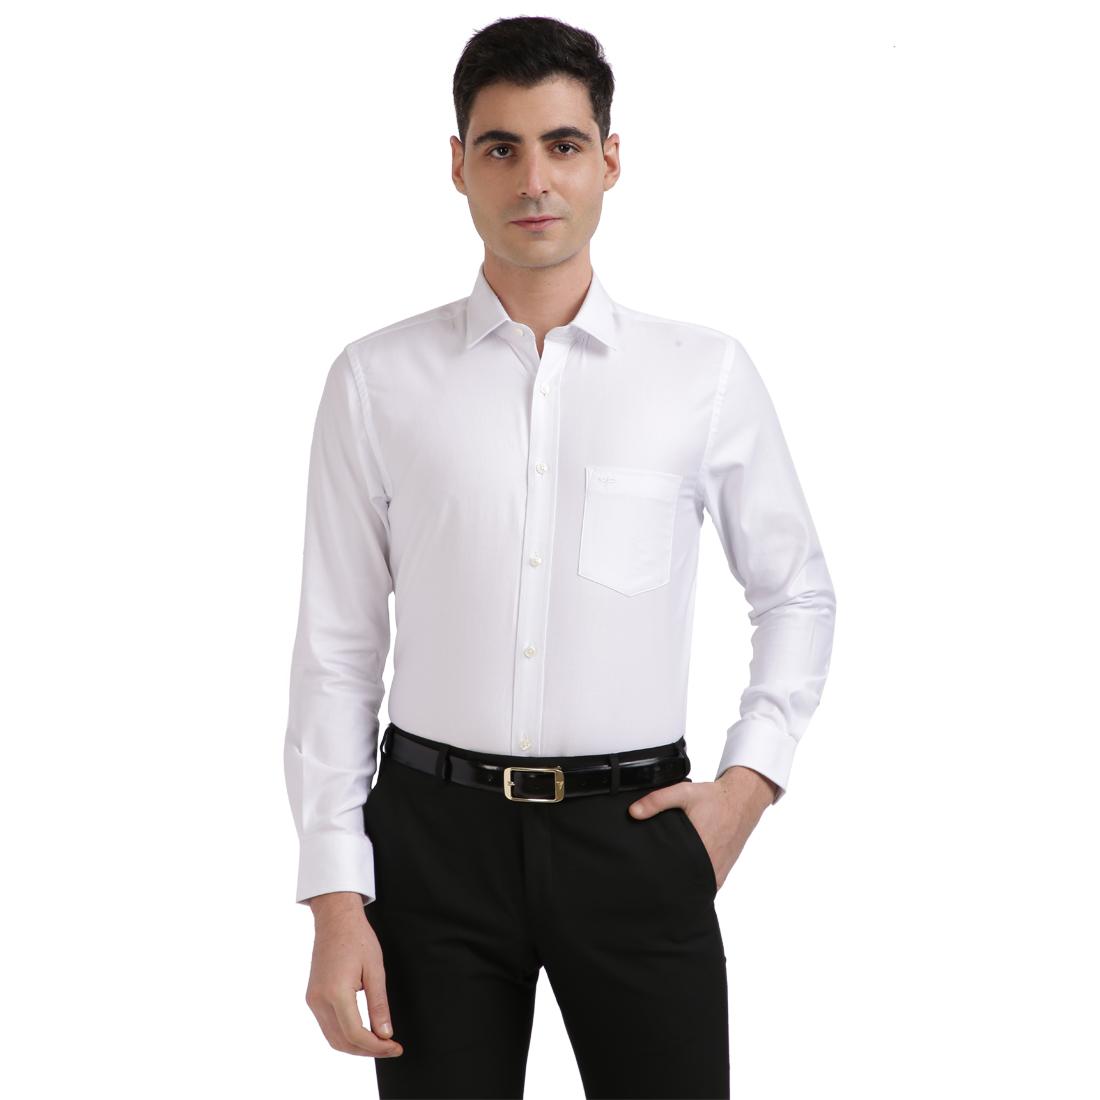 ColorPlus   ColorPlus White Shirts